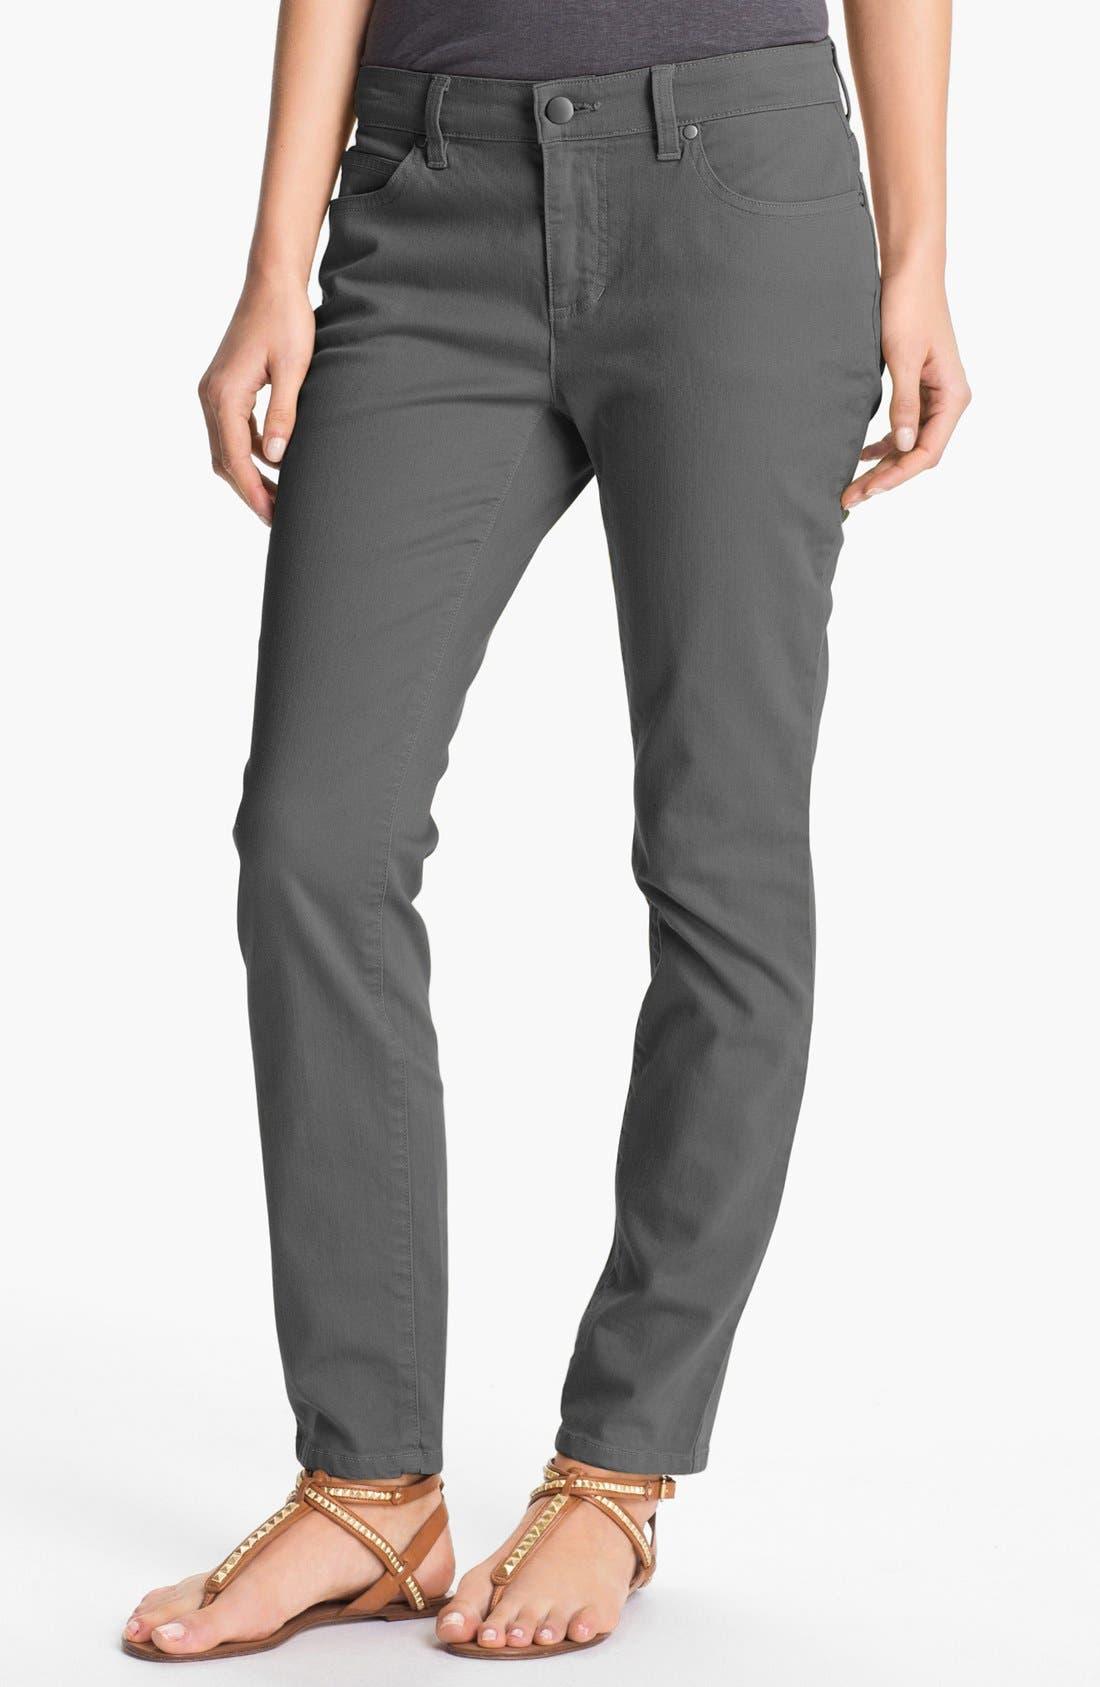 Alternate Image 1 Selected - Eileen Fisher Skinny Ankle Jeans (Regular & Petite)